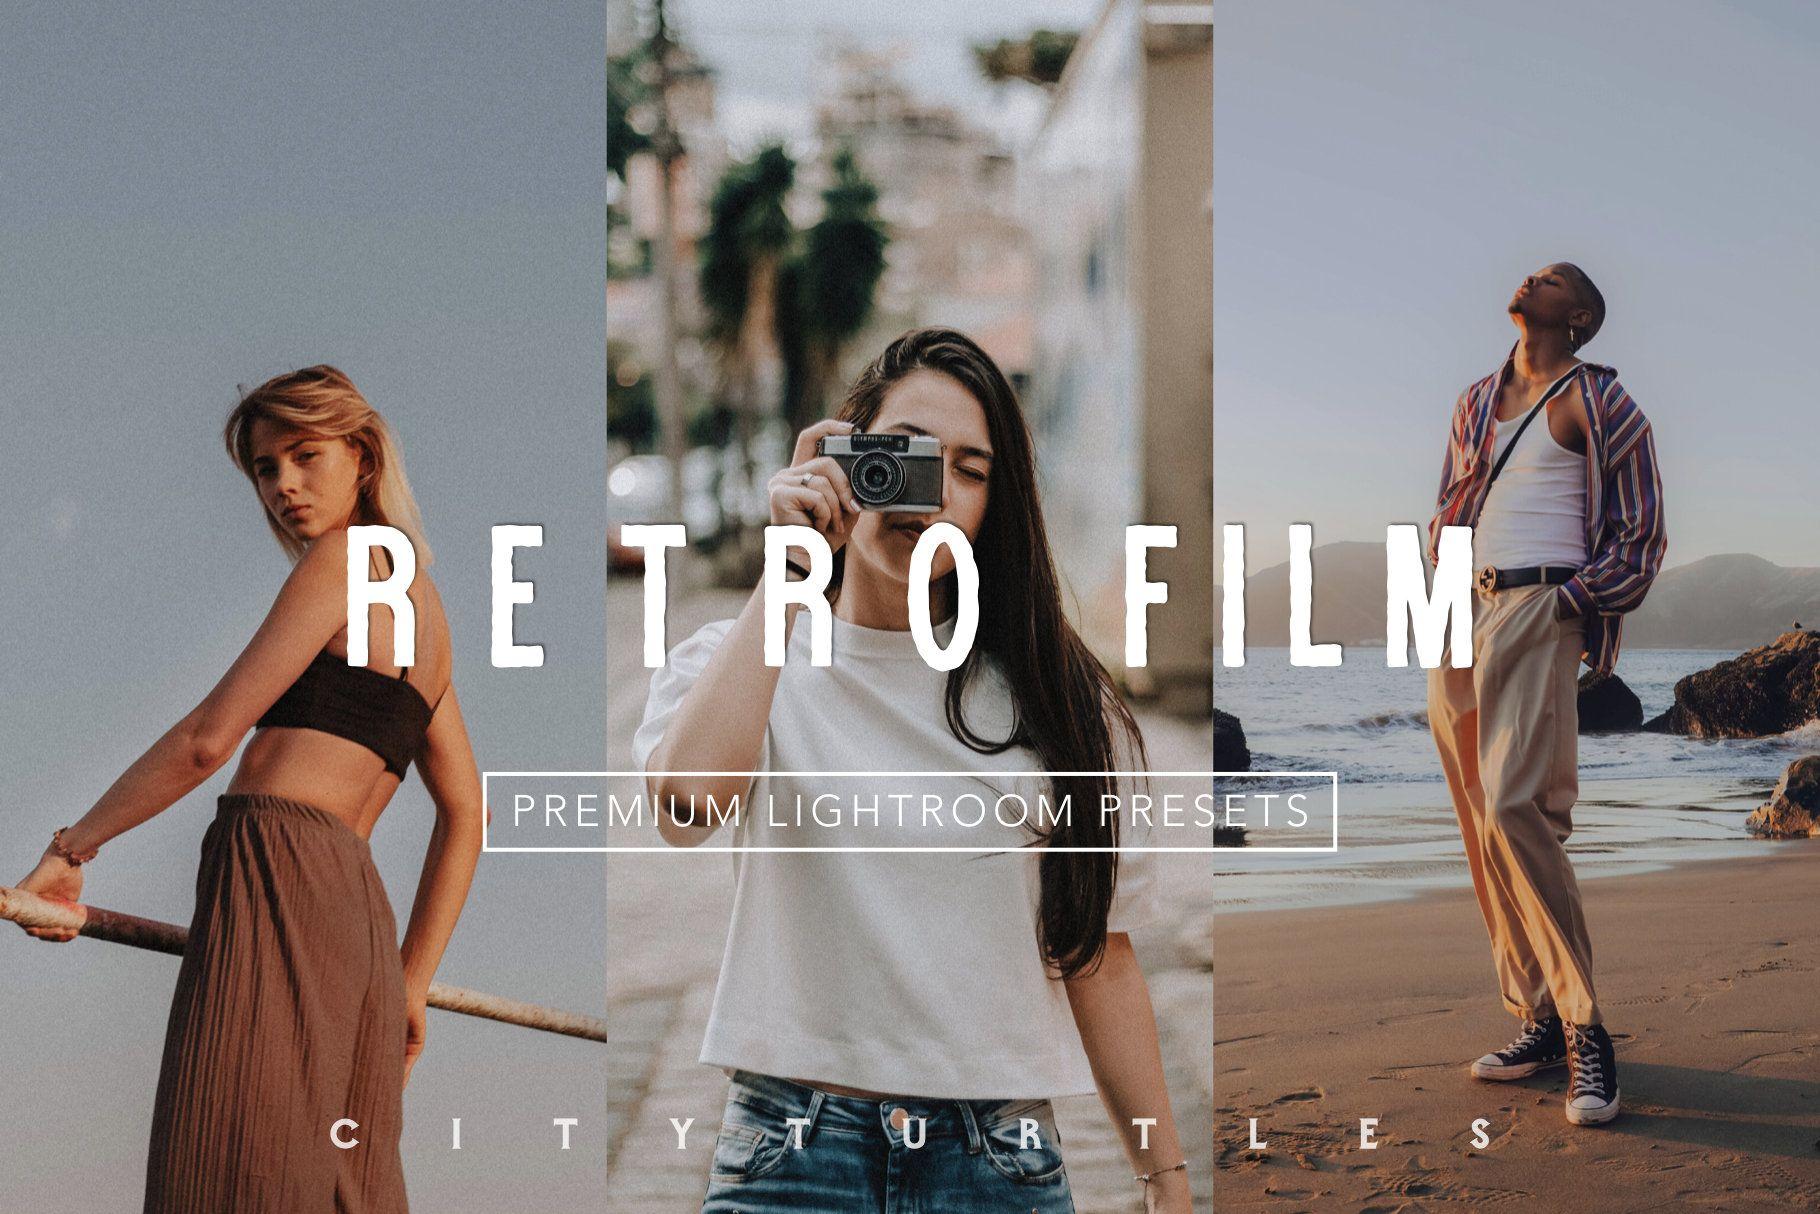 Moody Retro Film Color Lightroom Presets For Desktop Mobile One Click Photographer Editing Tools In 2020 Film Presets Lightroom Retro Film Film Presets